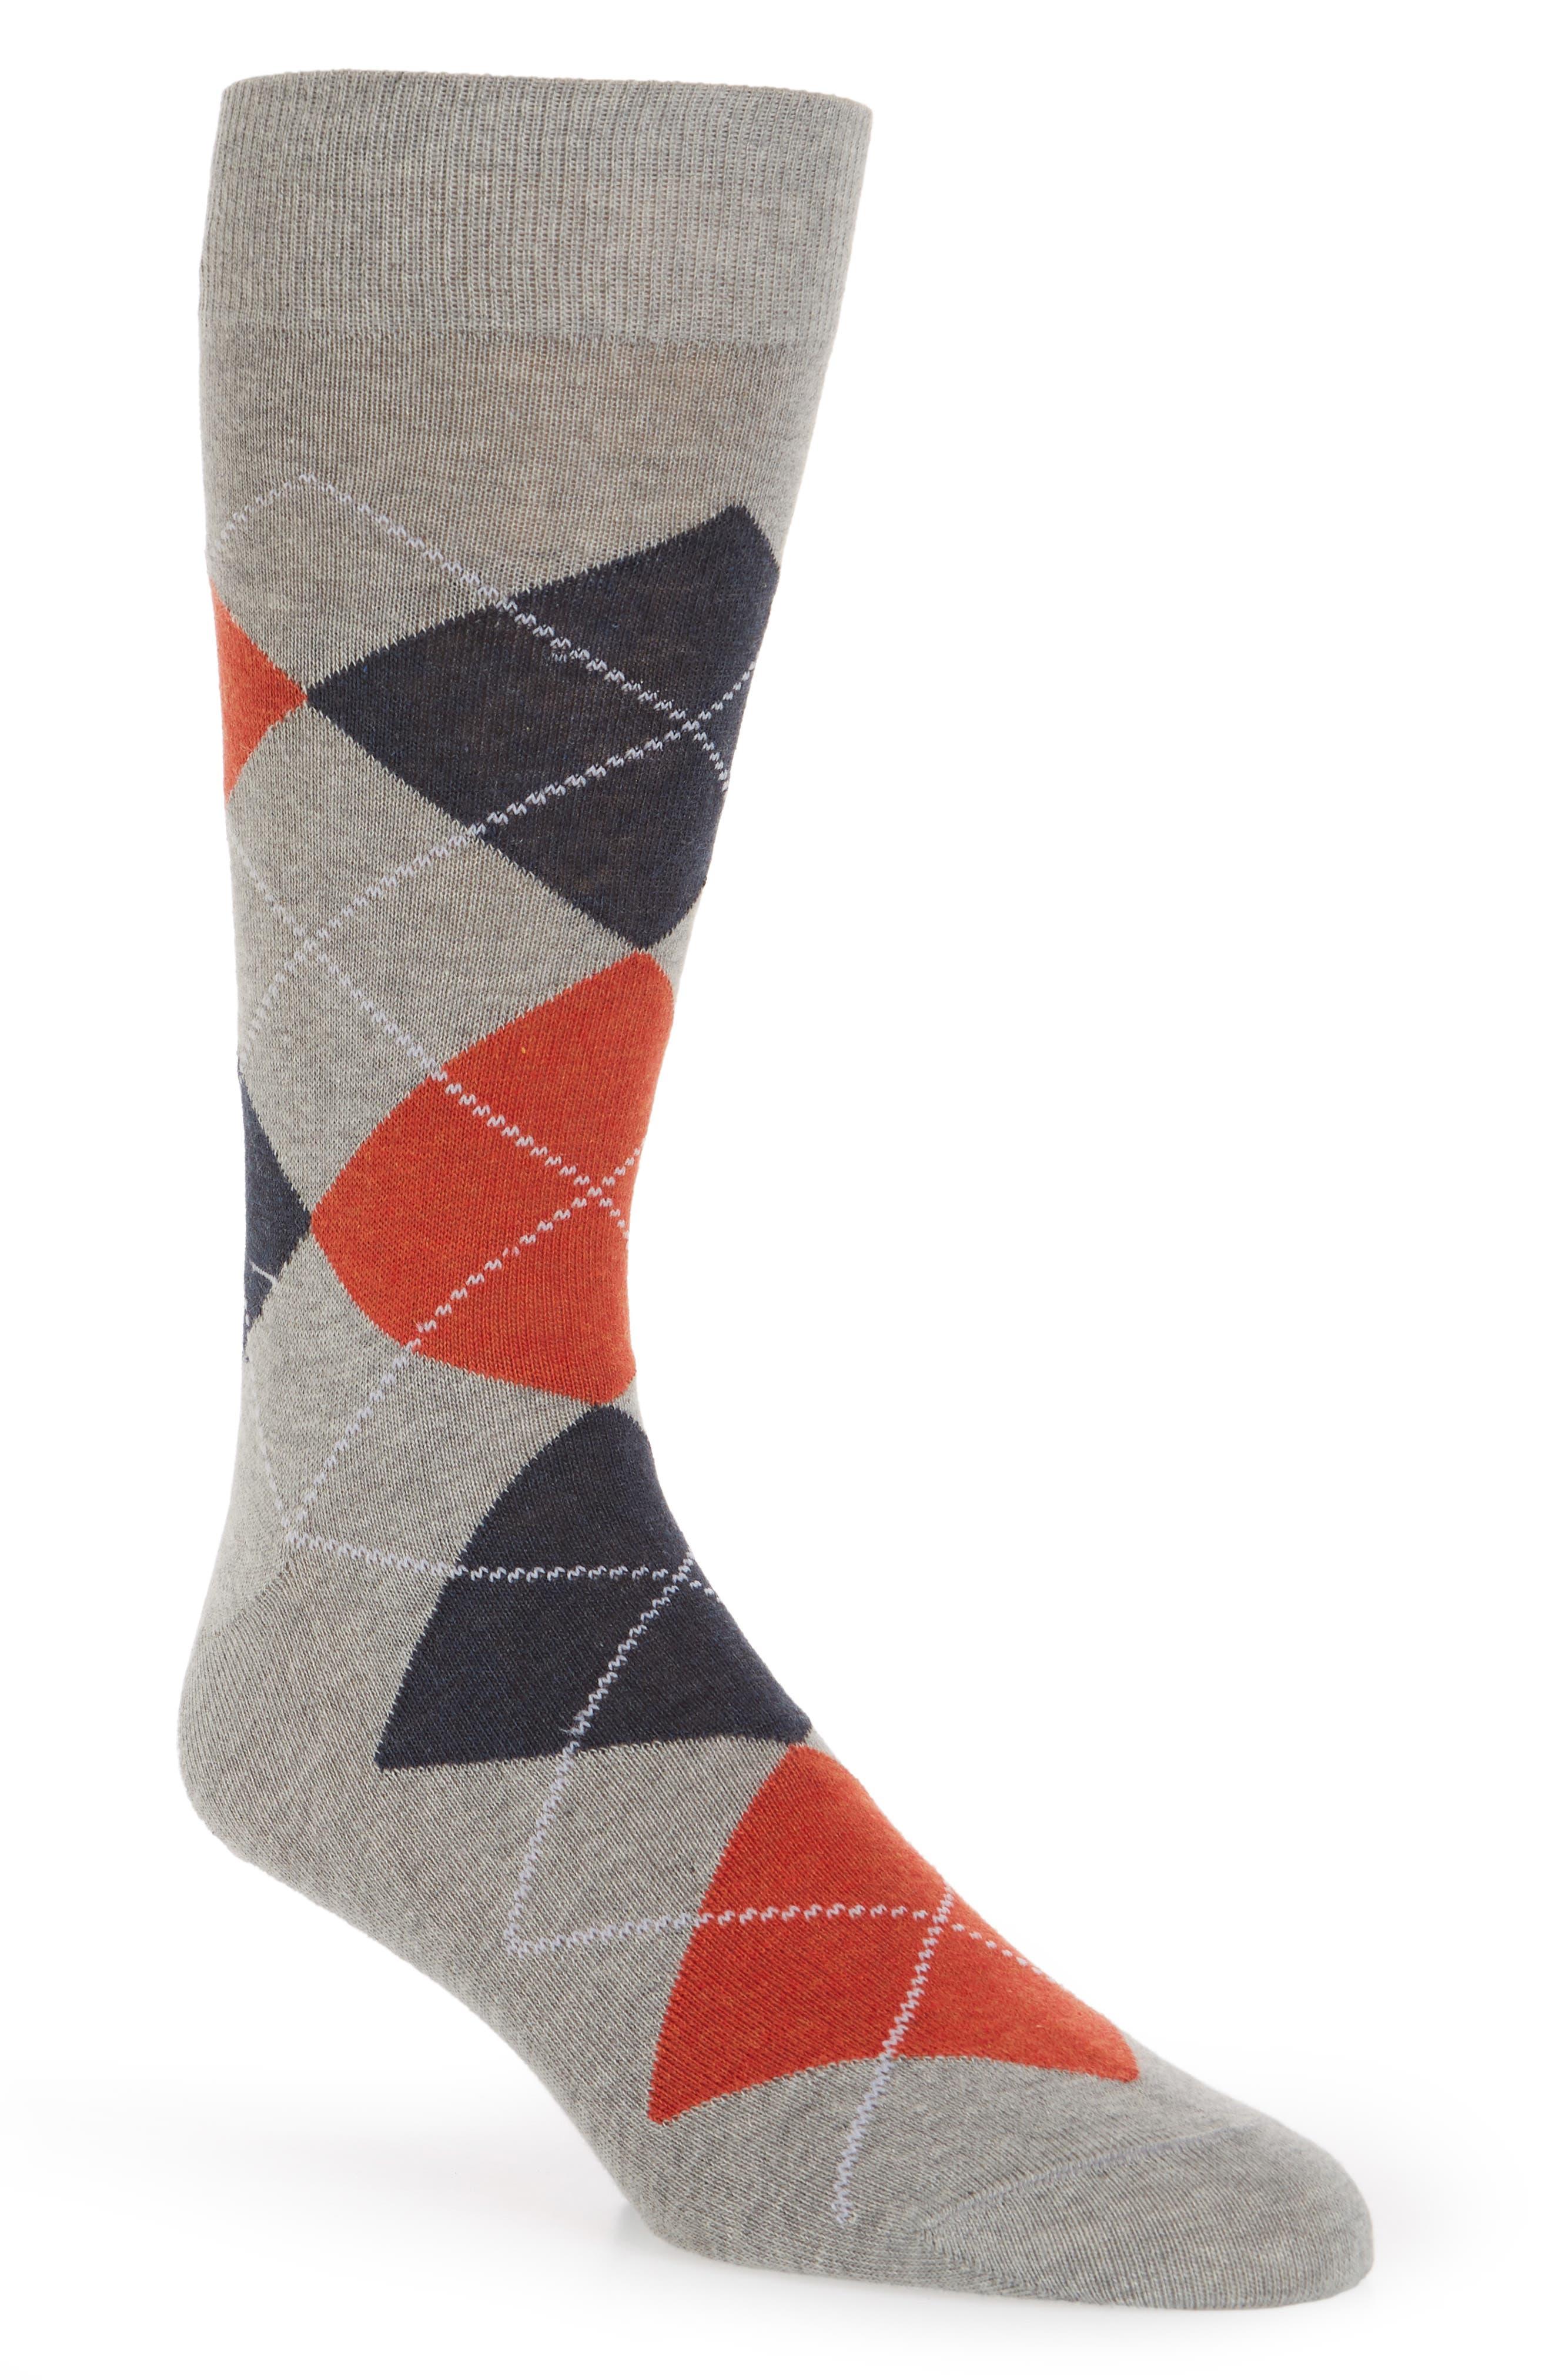 Argyle Socks,                             Main thumbnail 1, color,                             Light Grey